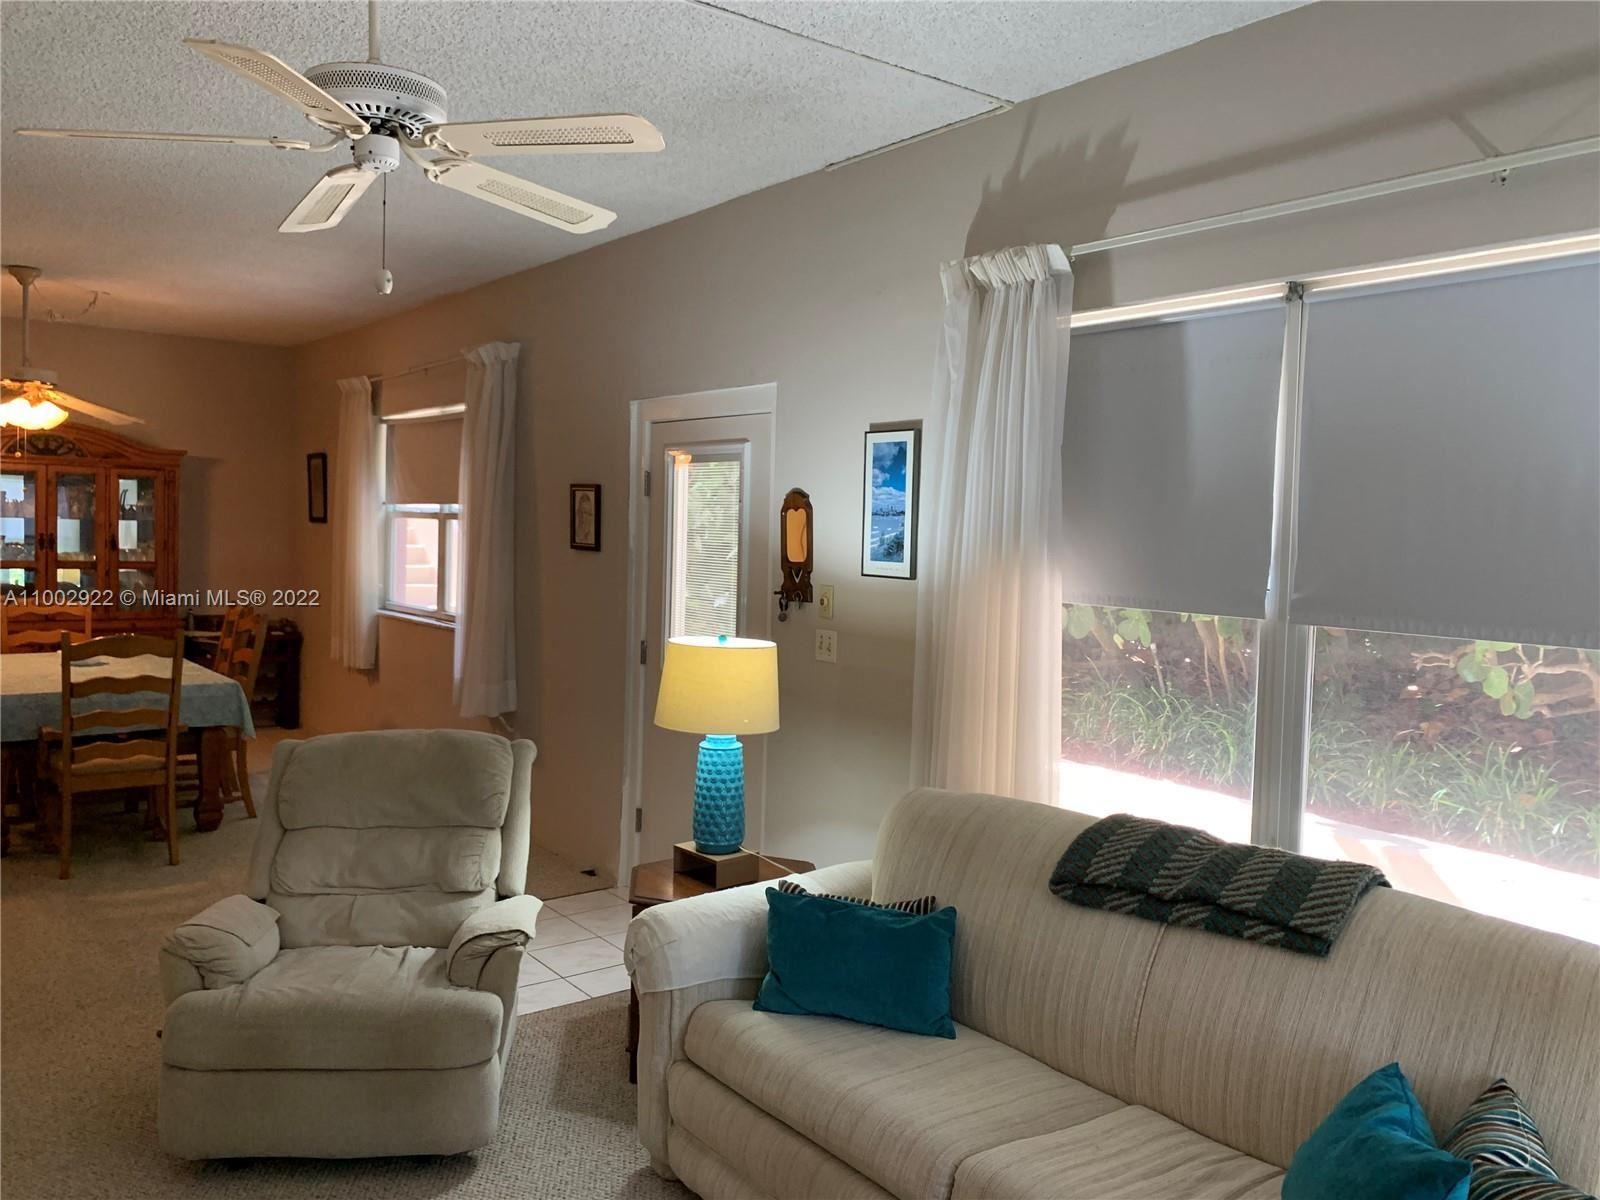 Photo of 2921 S Ocean Blvd #G1, Highland Beach, FL 33487 (MLS # A11002922)